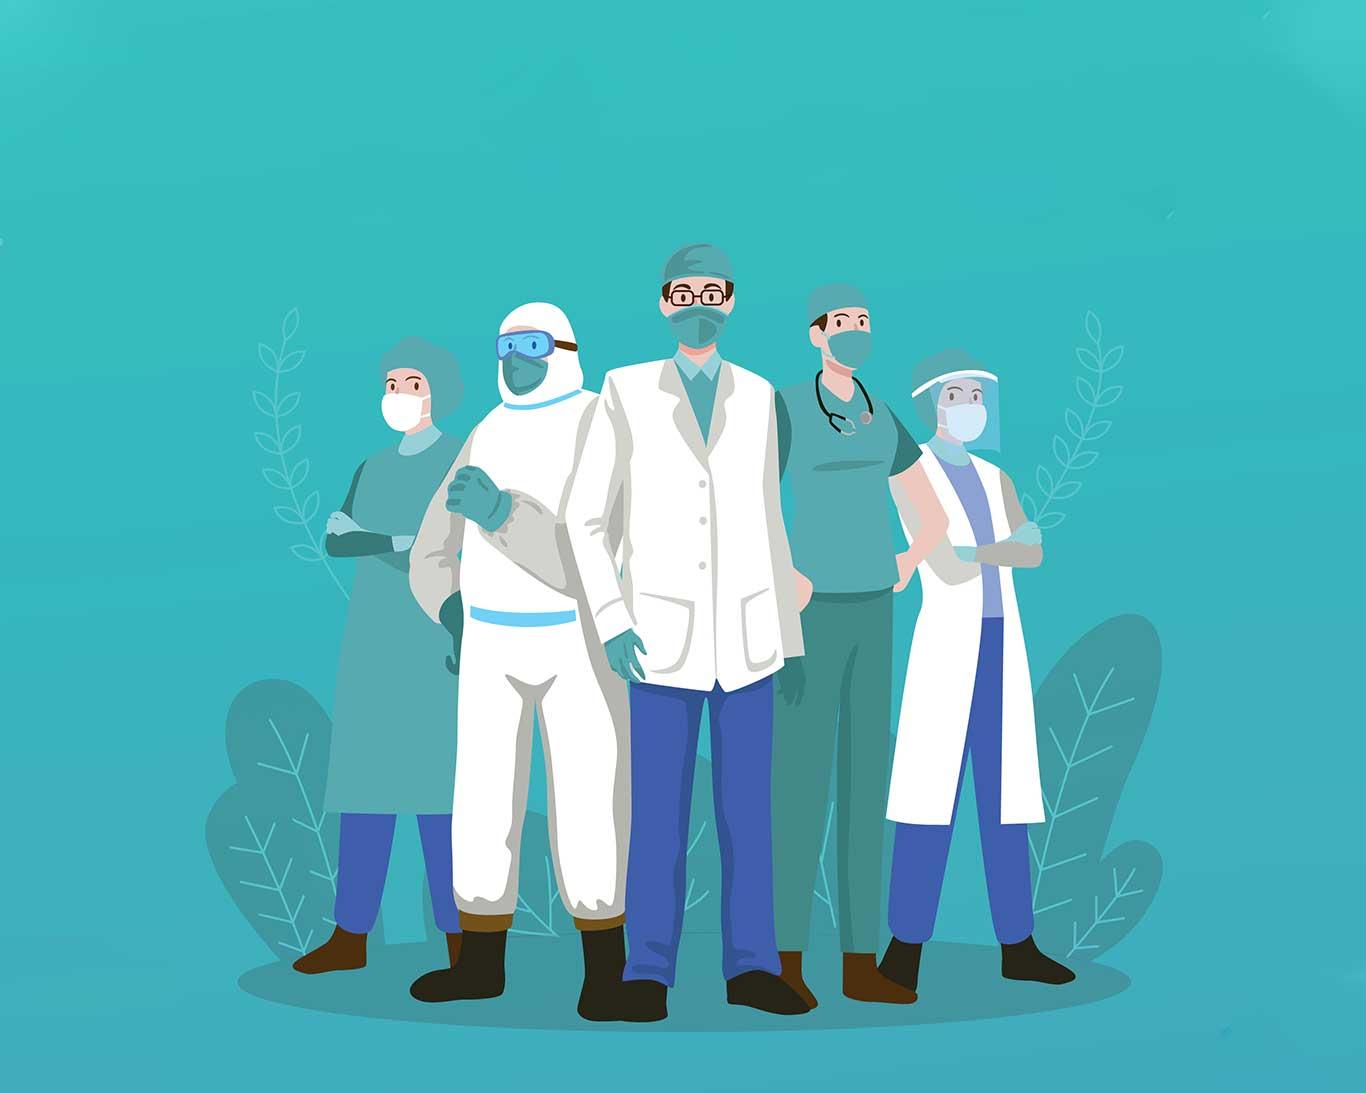 Life after coronavirus outbreak